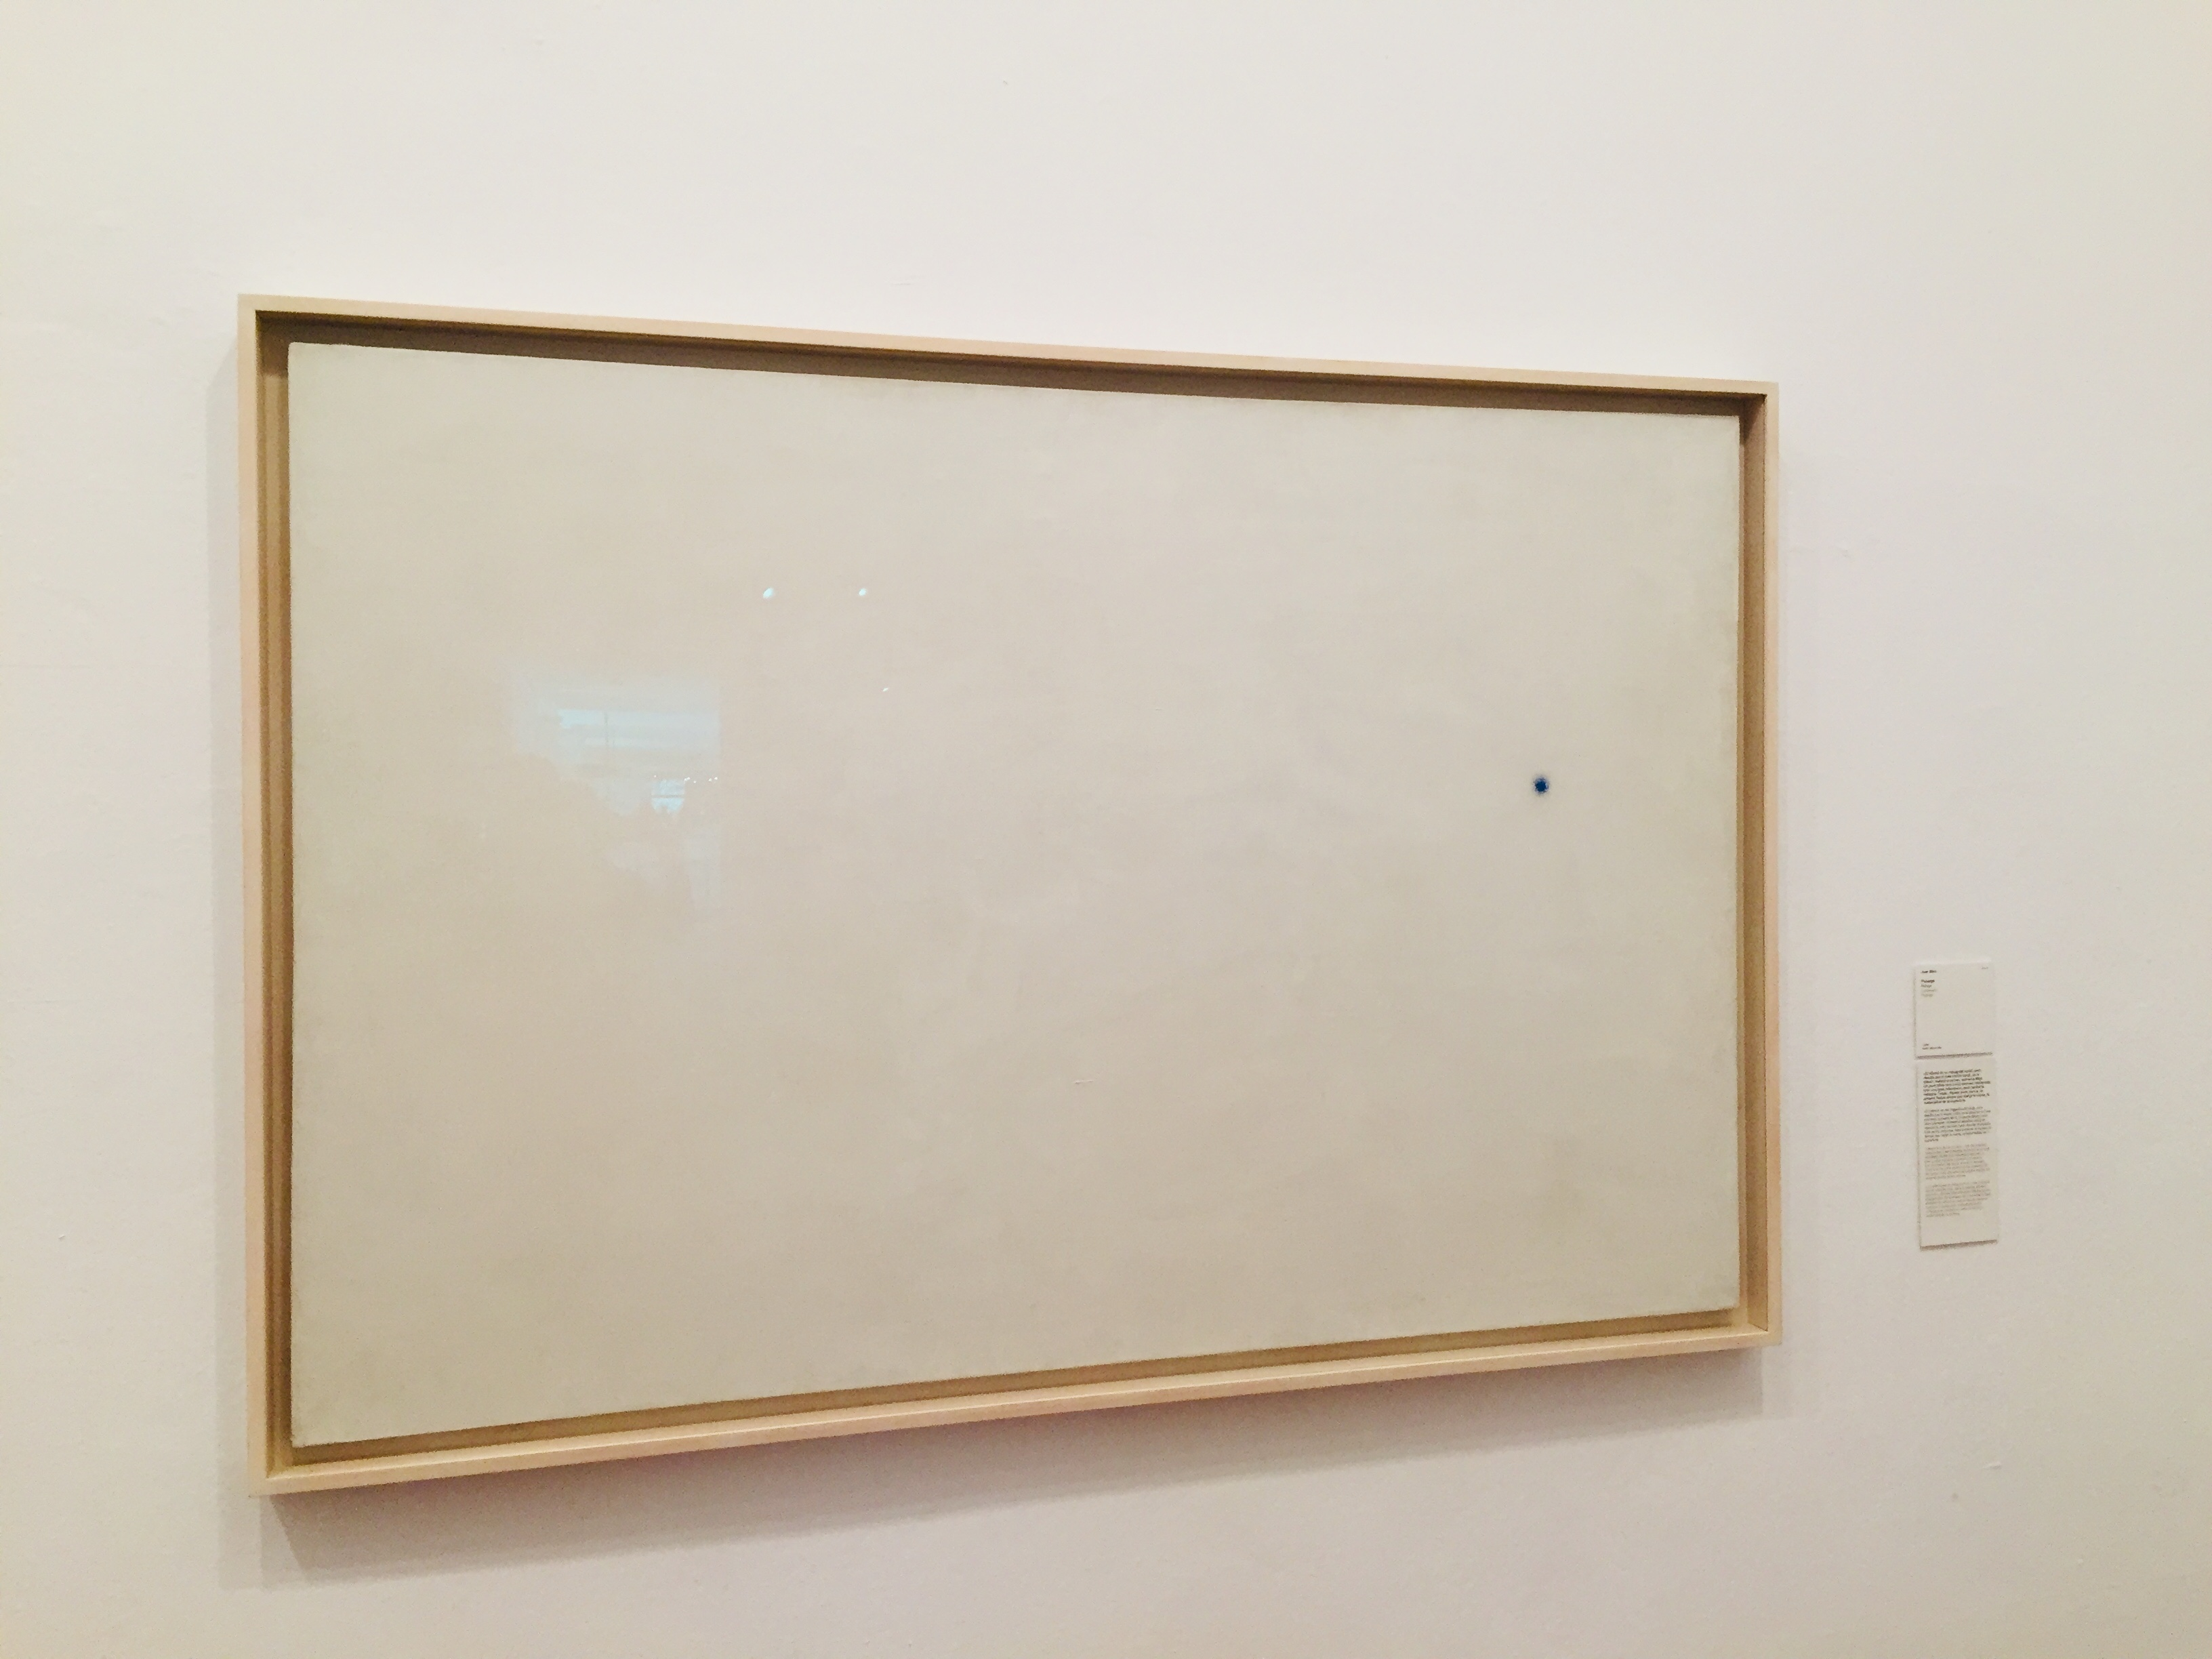 Miro Painting: On the Dot